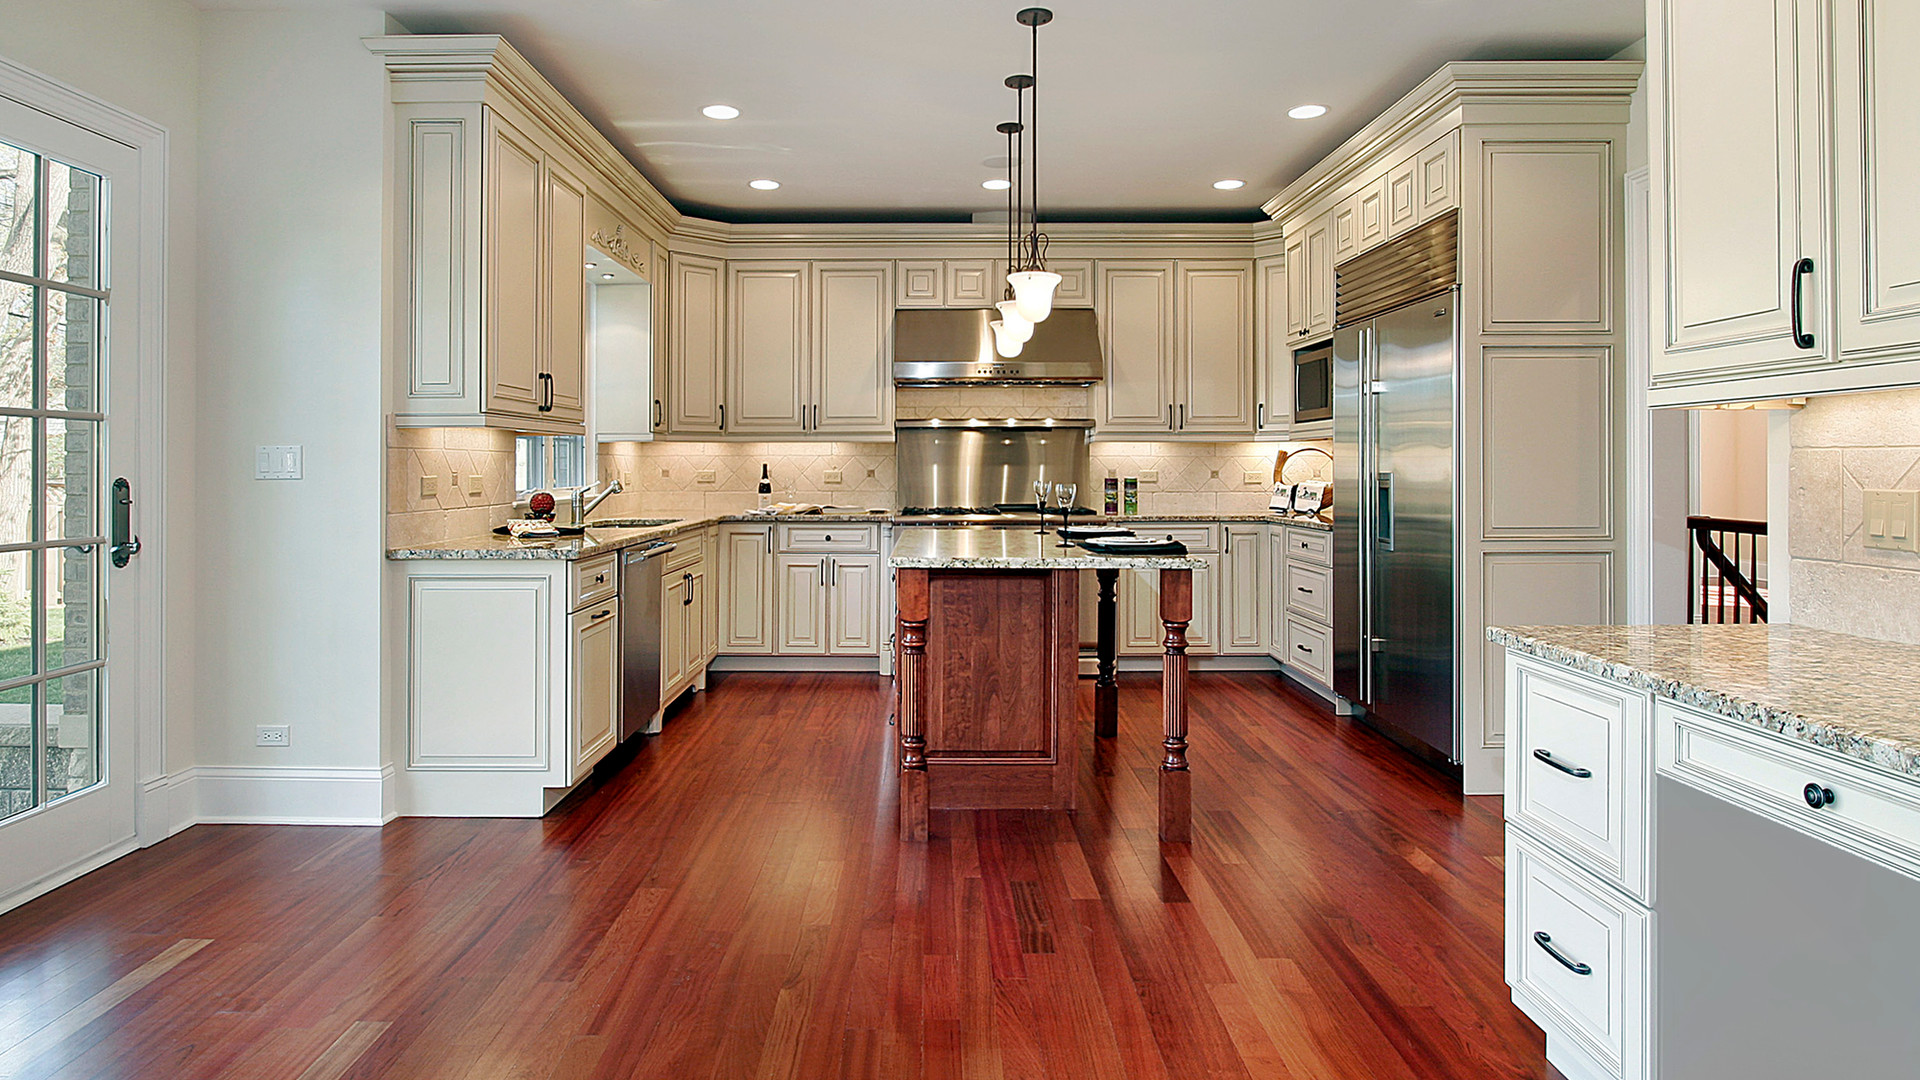 kitchen-with-cherry-wood-floor-12656978.